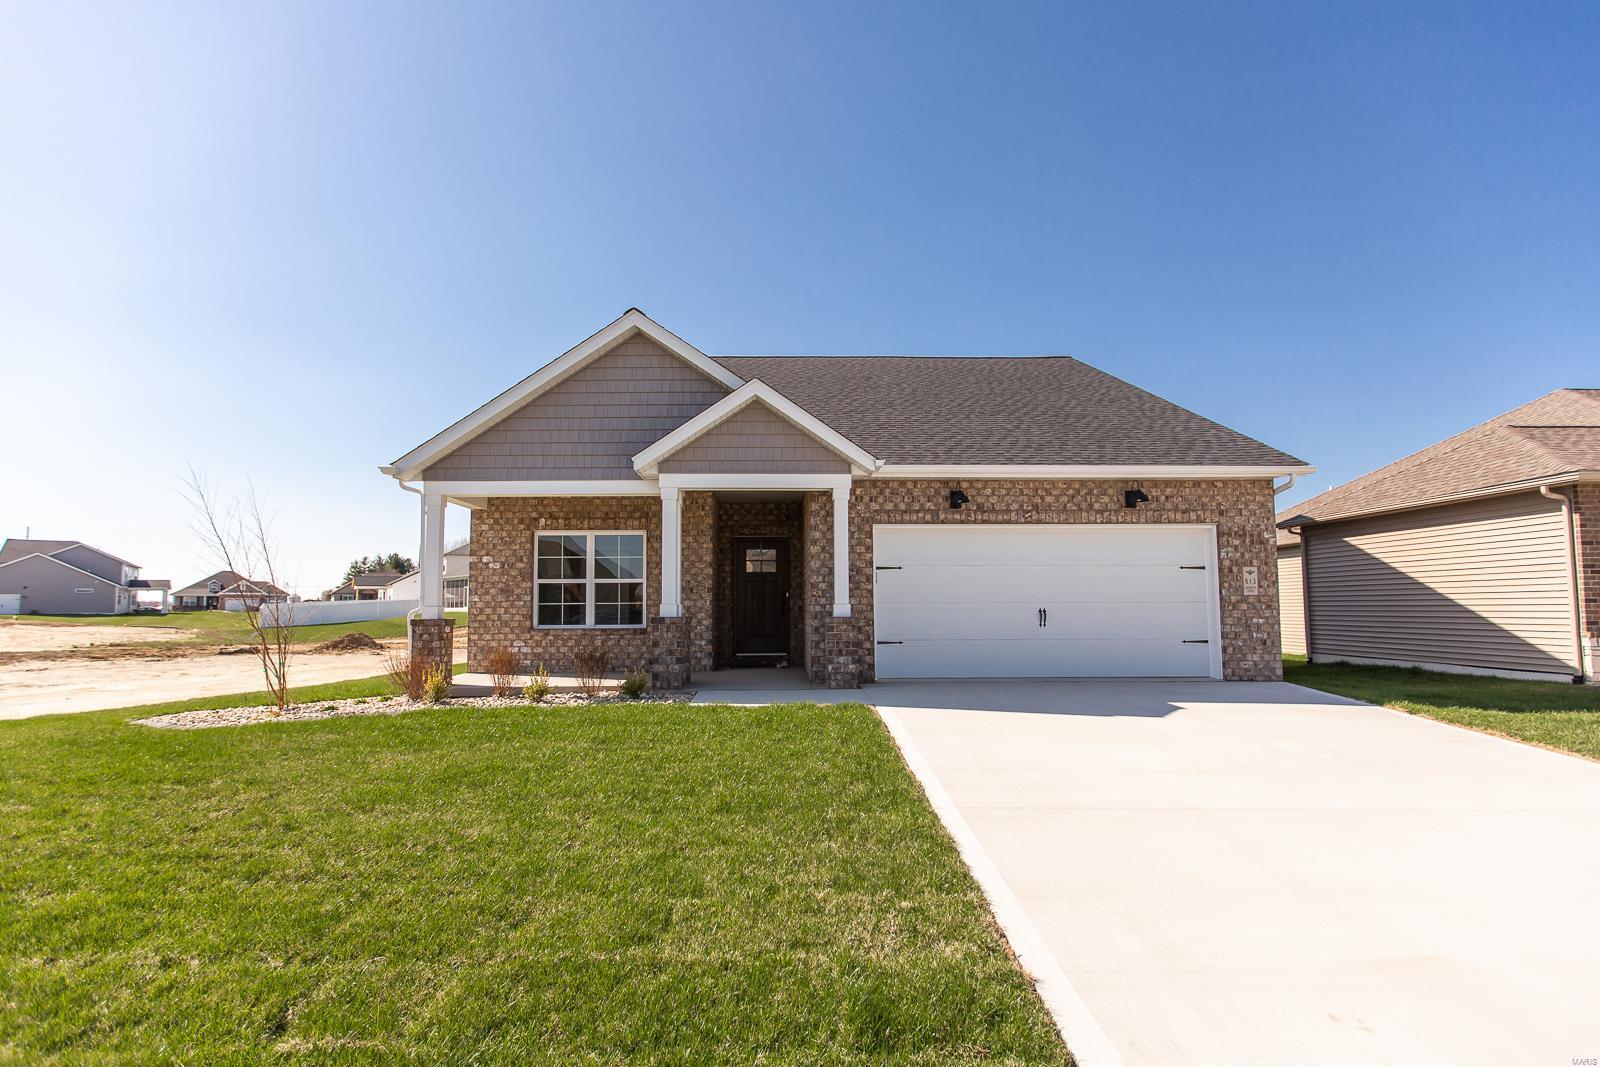 613 Ambrose Dr Property Photo - O'Fallon, IL real estate listing